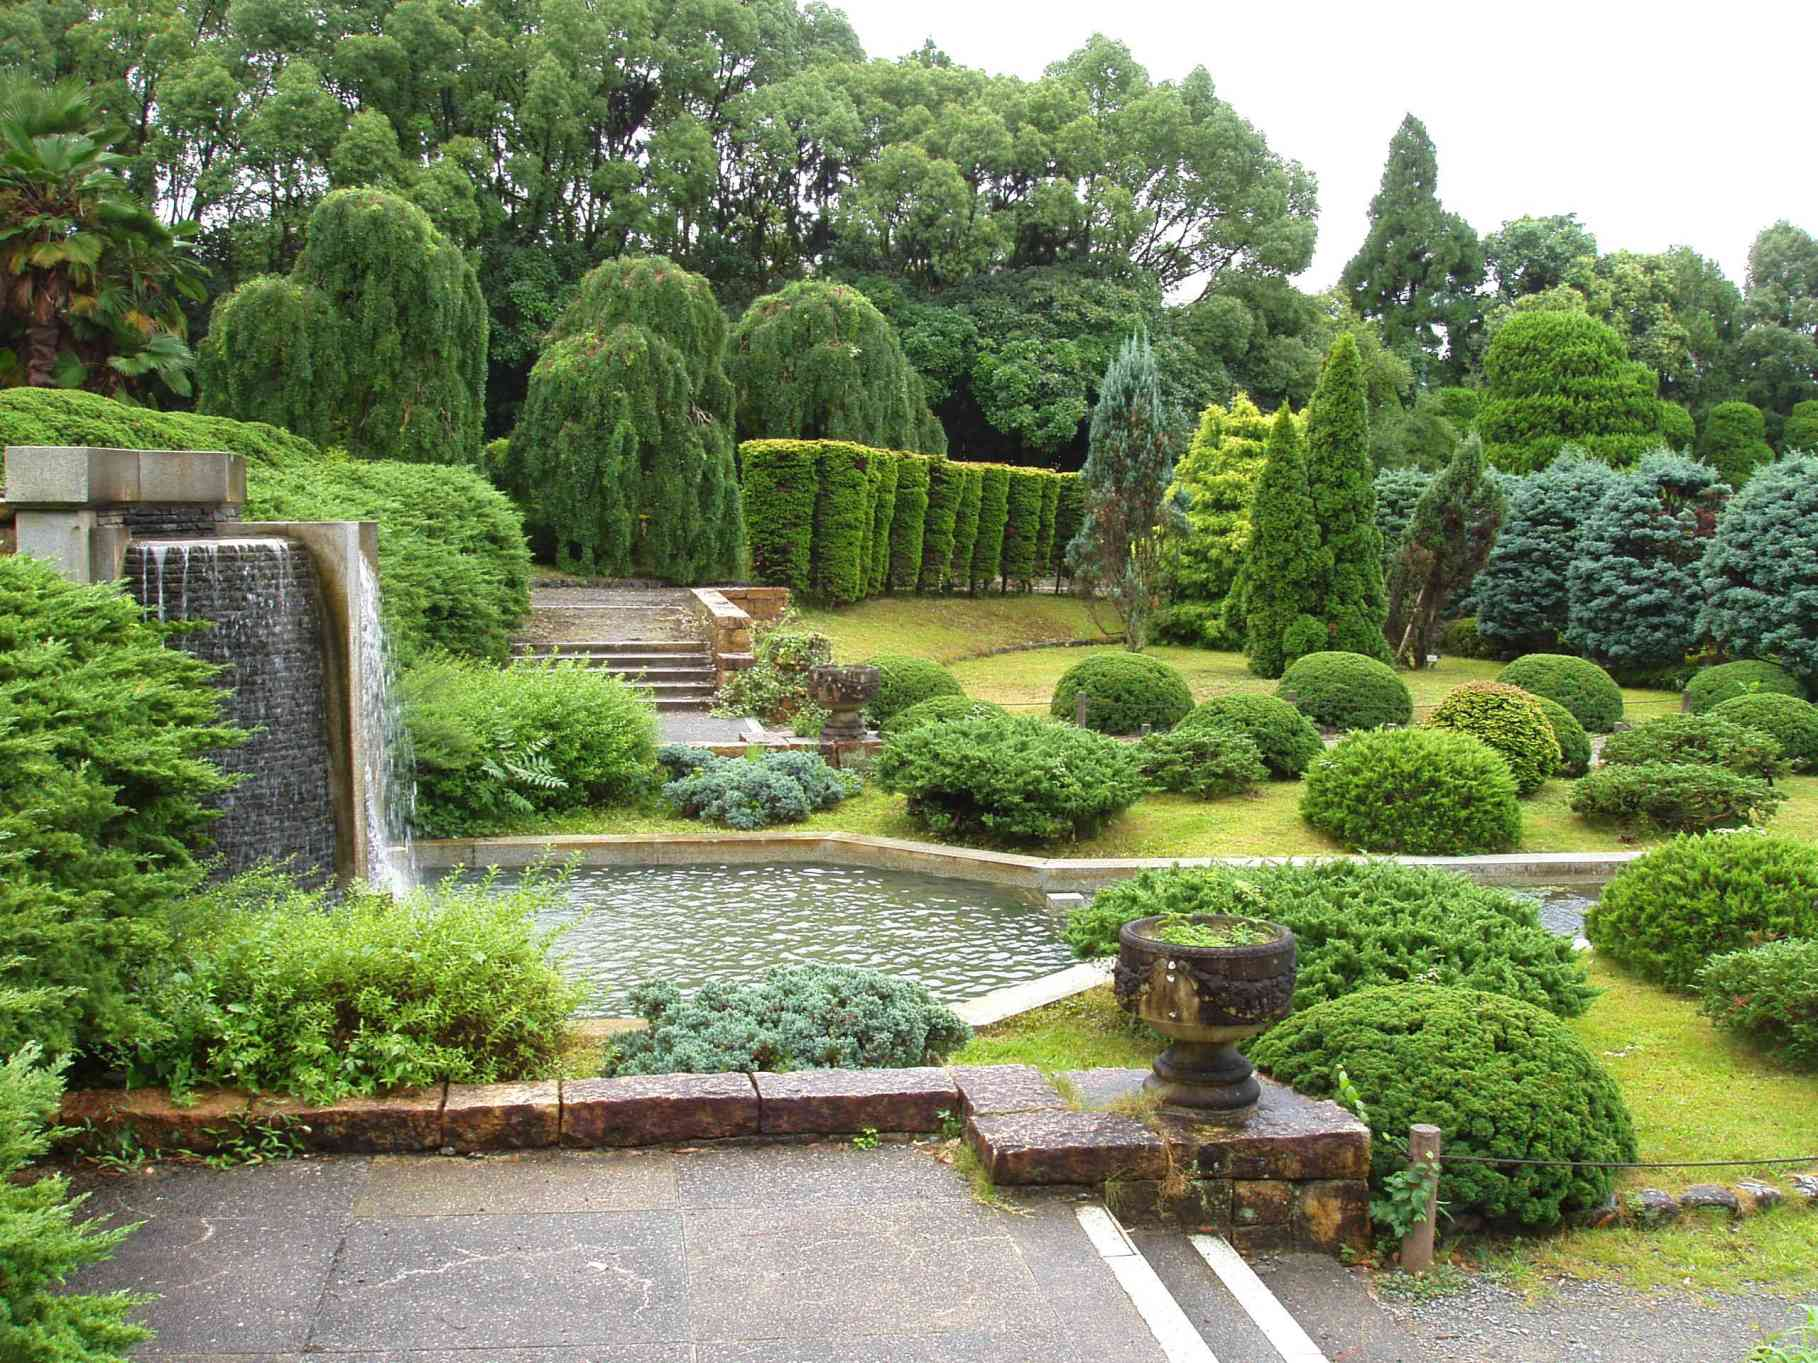 Nomes de plantas para jardim decorando casas for Suelos resistentes